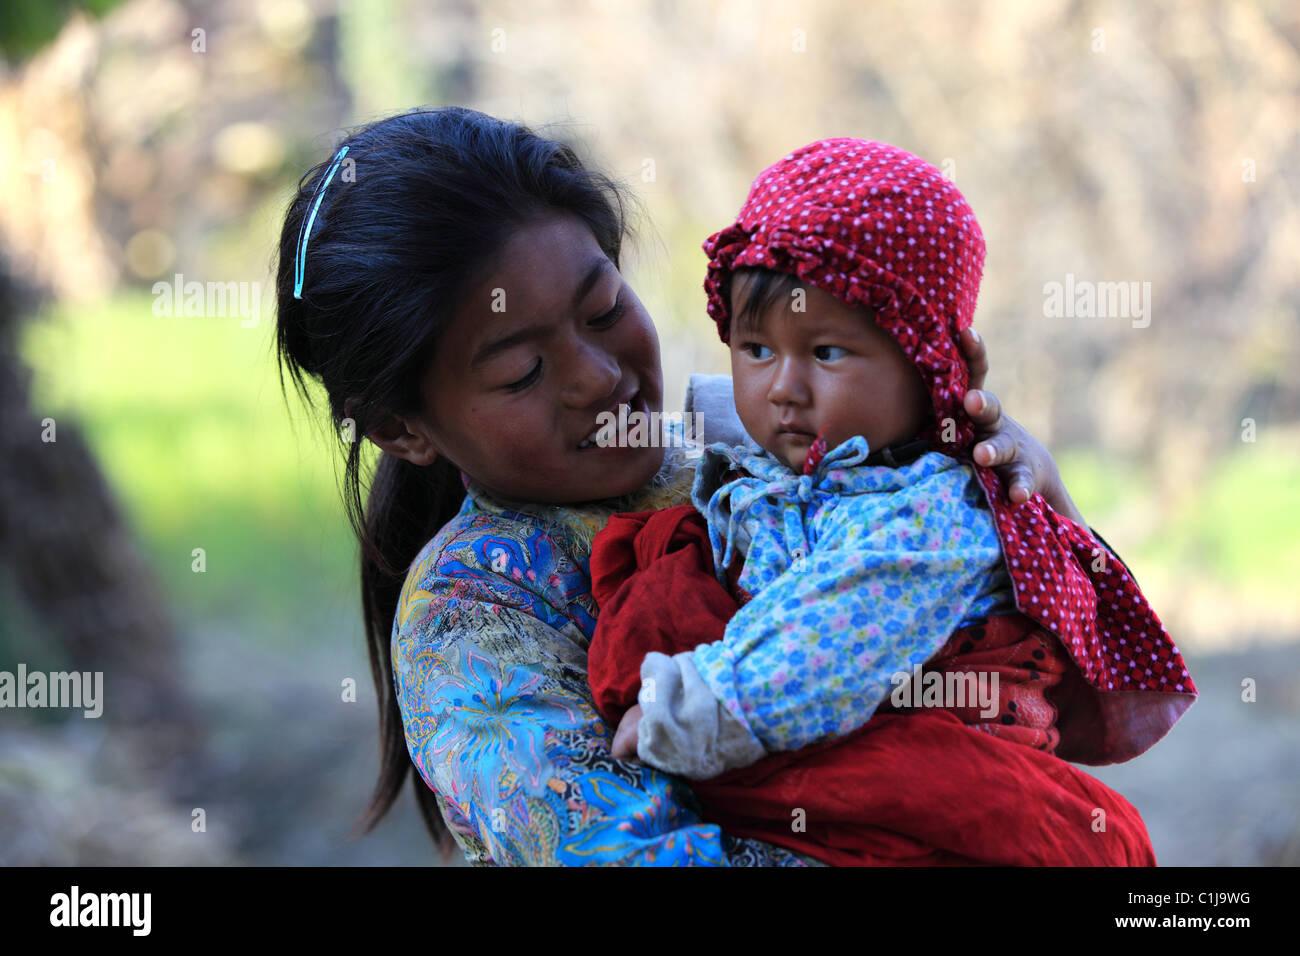 Nepal girl mother baby stock photos nepal girl mother baby stock nepali girl with child stock image ccuart Gallery